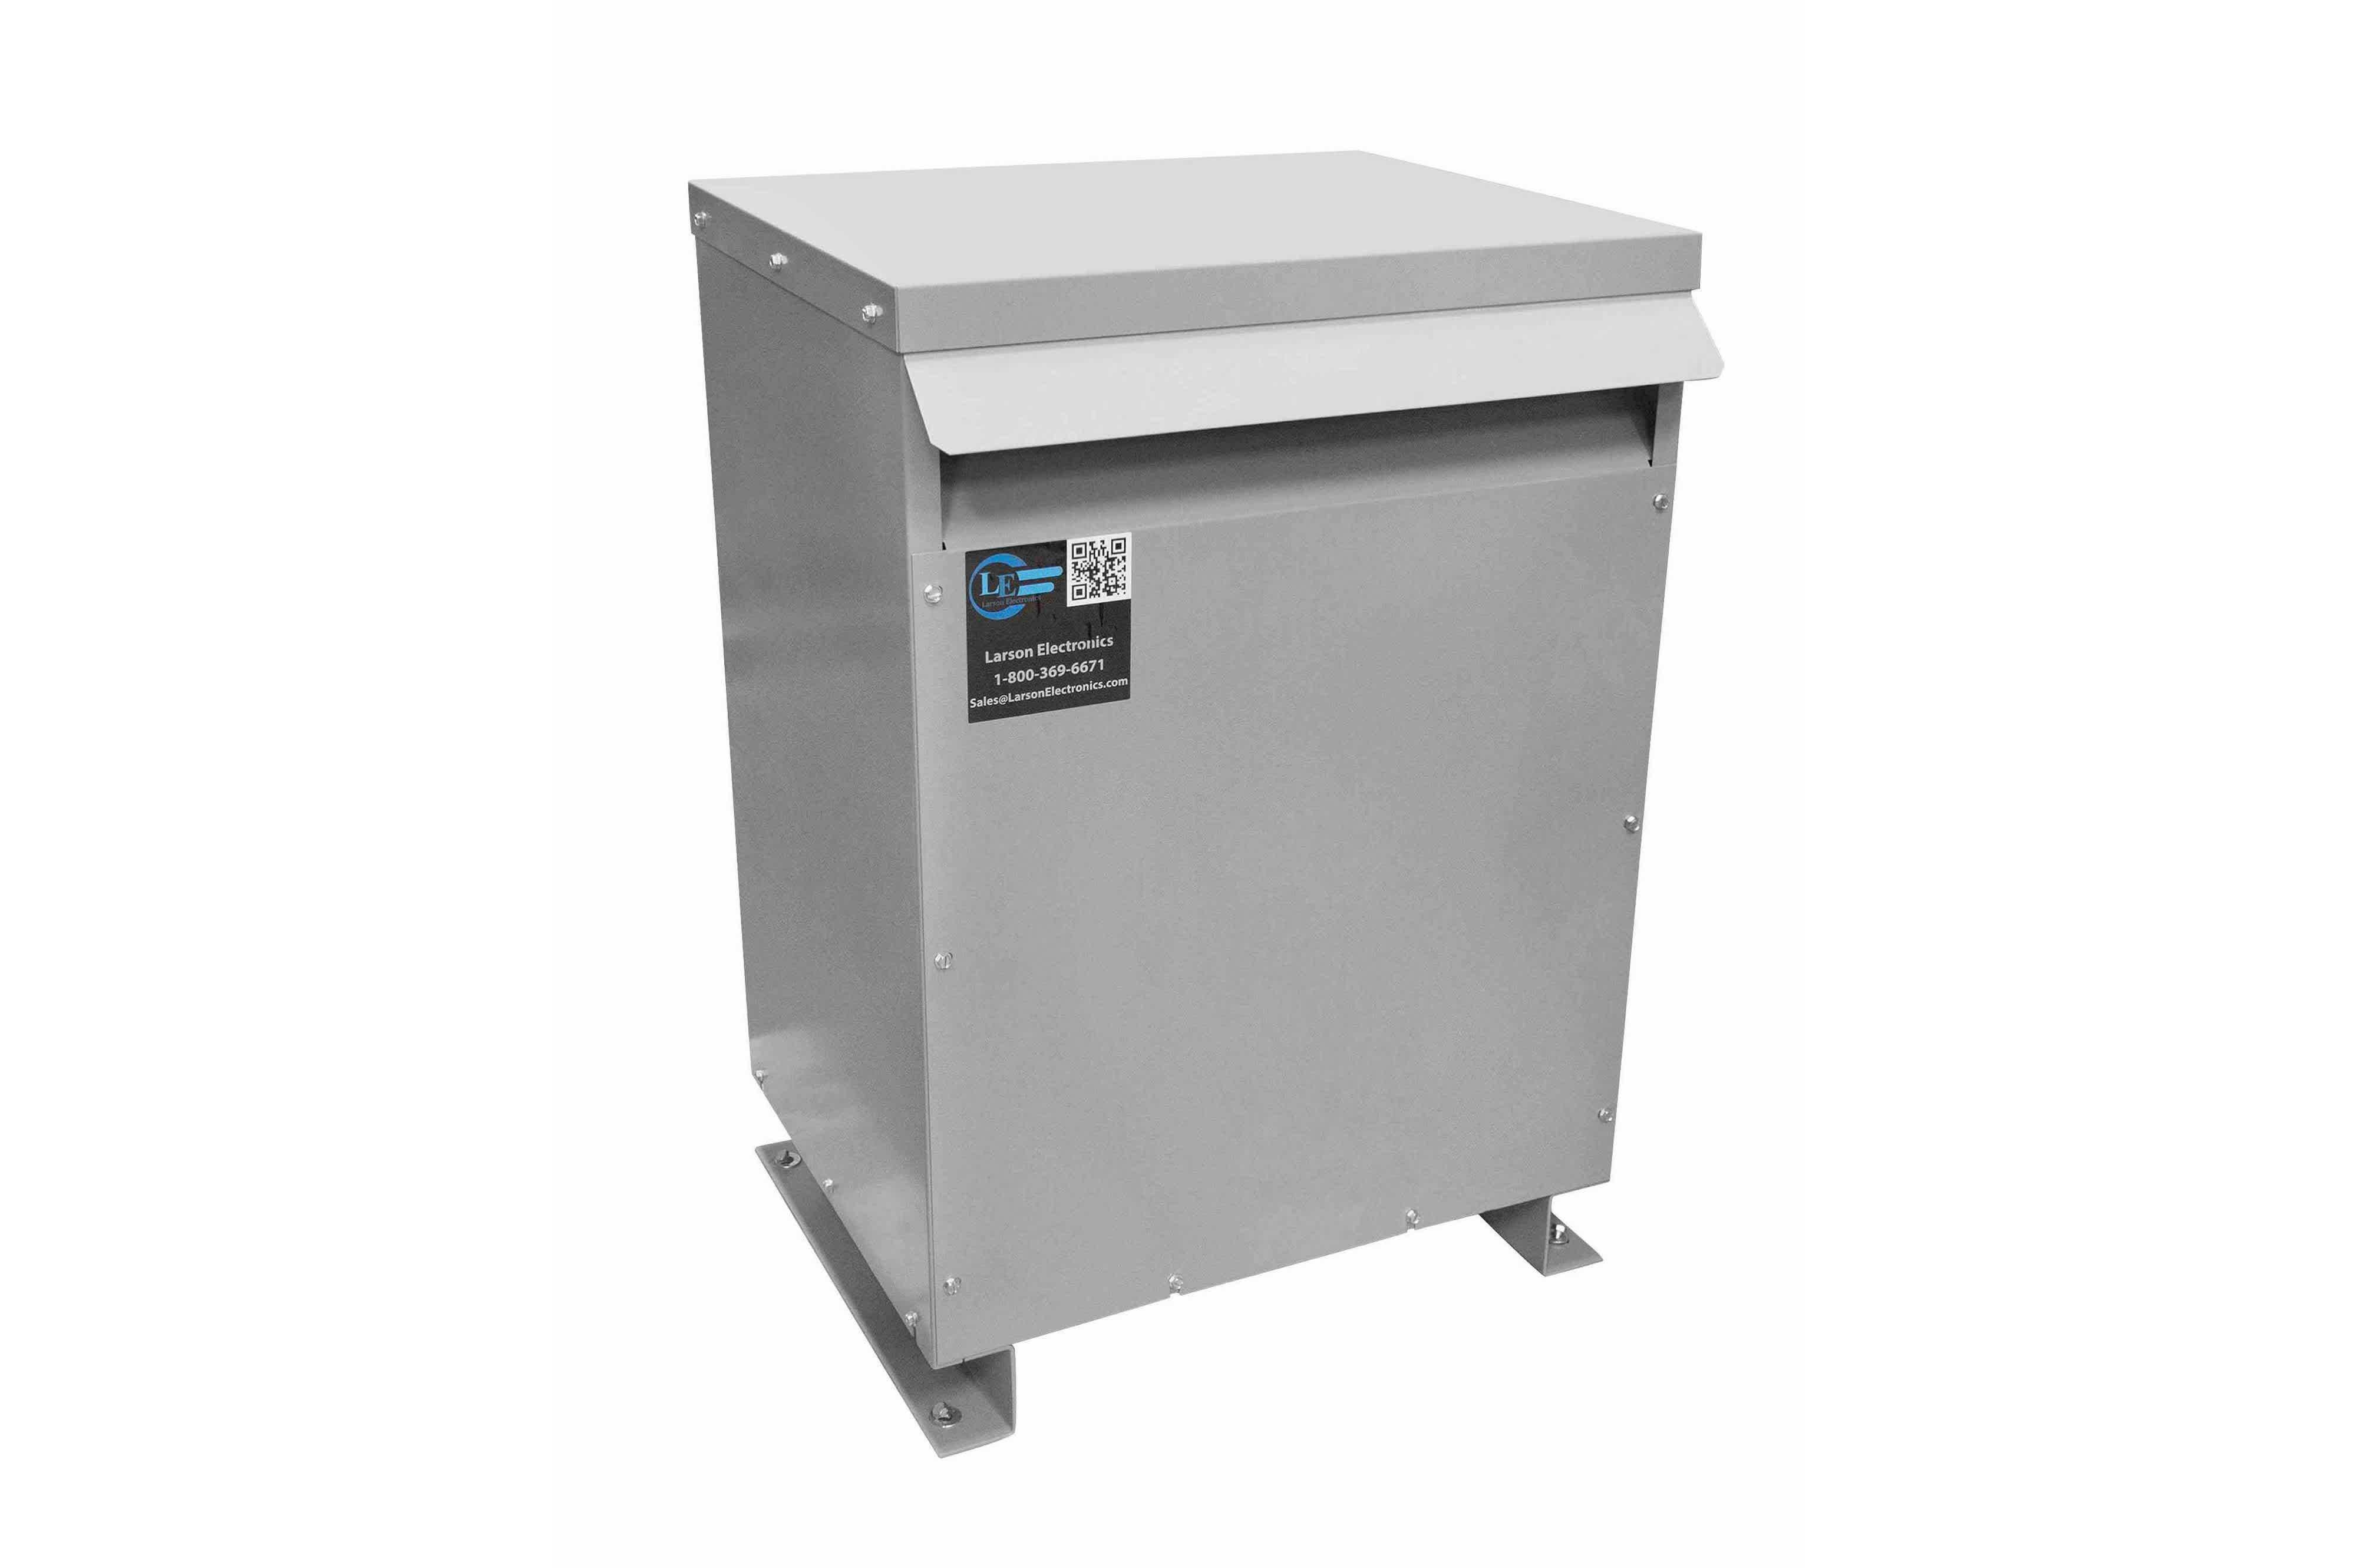 55 kVA 3PH Isolation Transformer, 380V Wye Primary, 600Y/347 Wye-N Secondary, N3R, Ventilated, 60 Hz